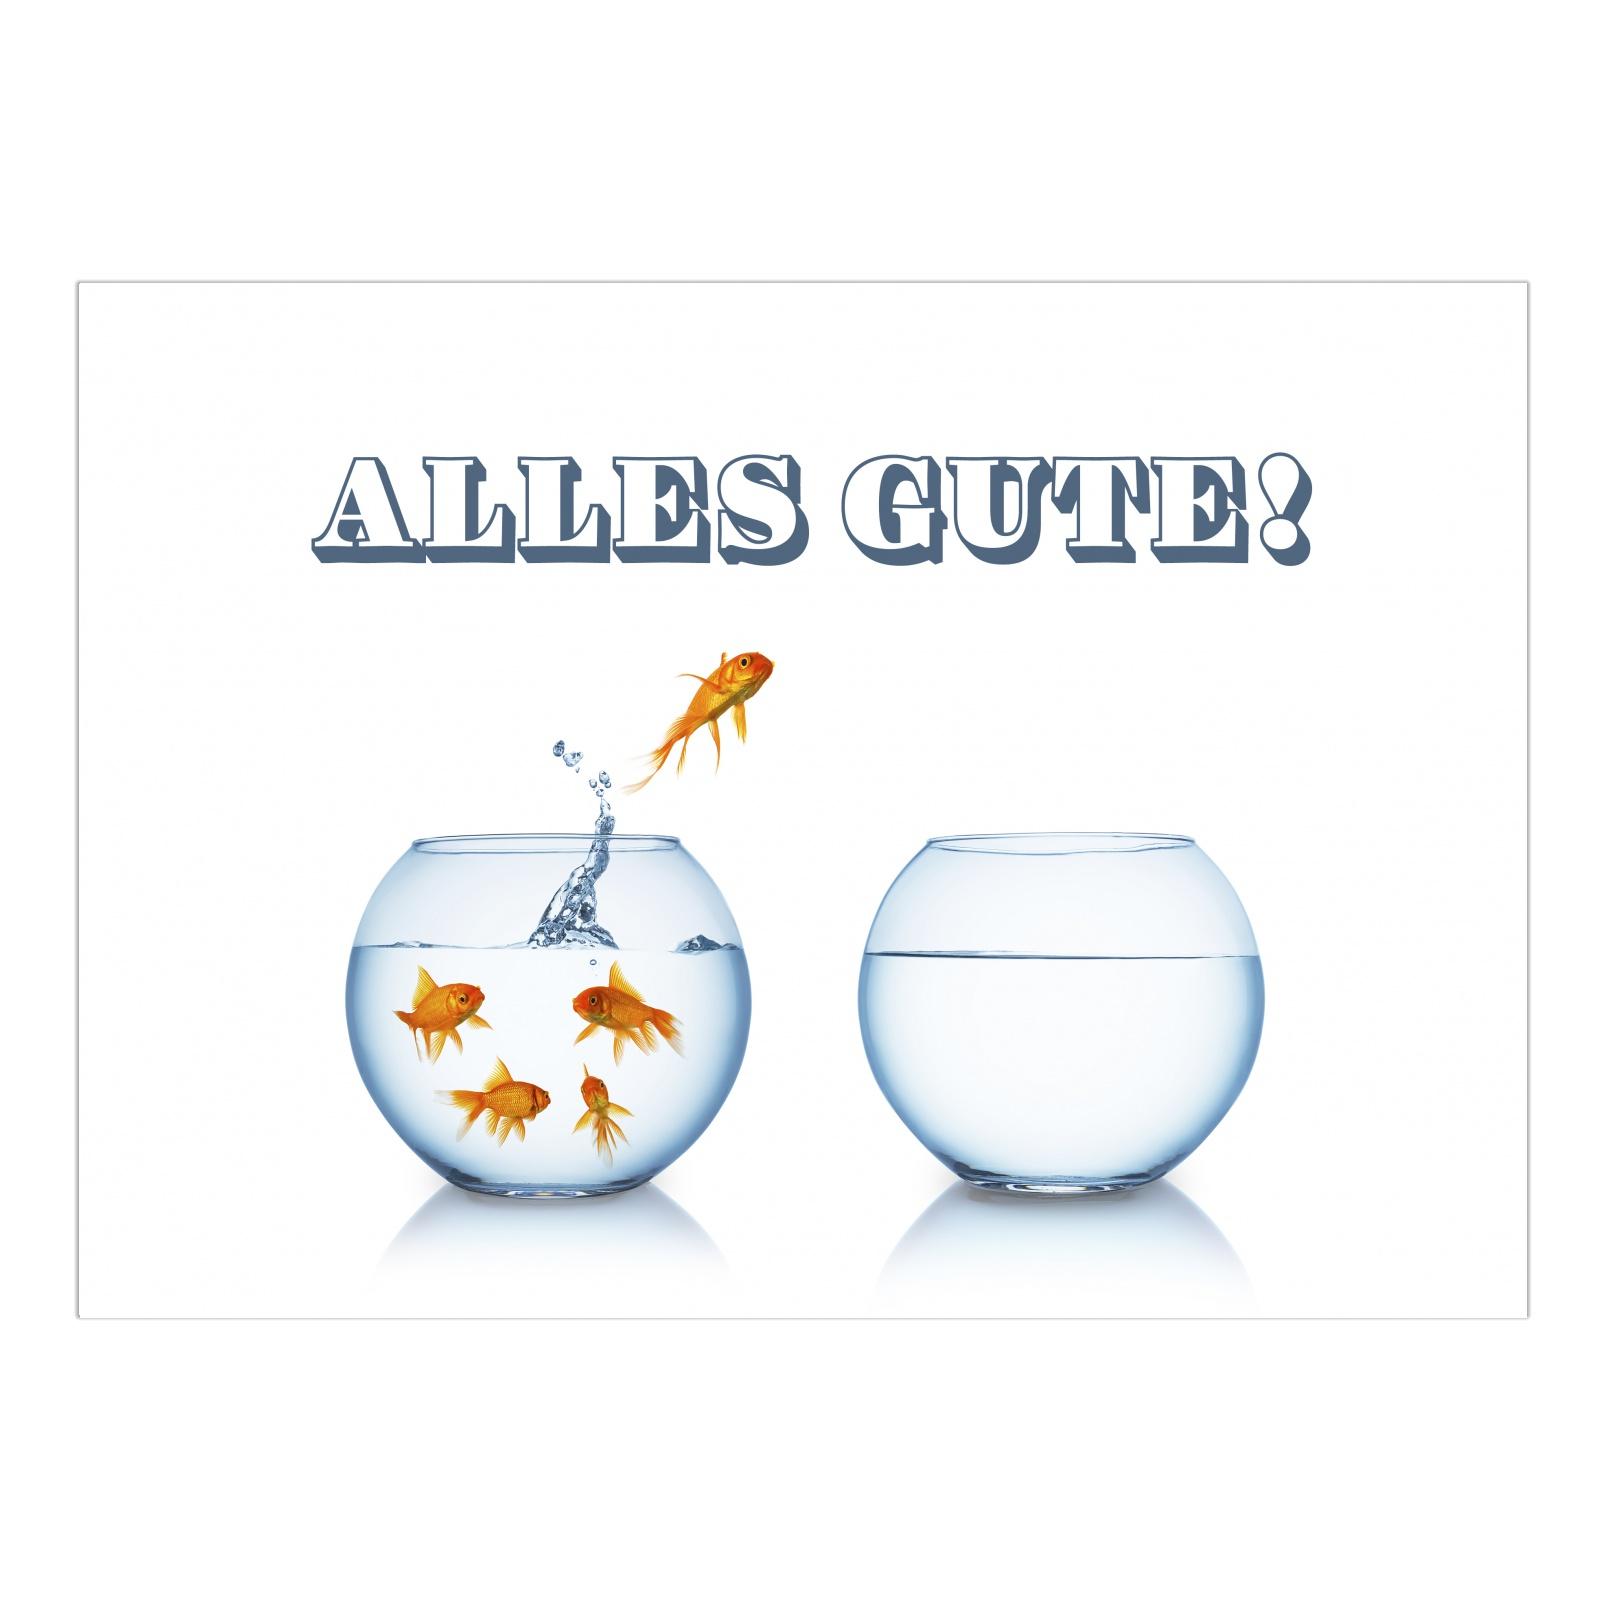 Gro e abschiedskarte umschlag a4 goldfische abschied for Abschied kollege ruhestand